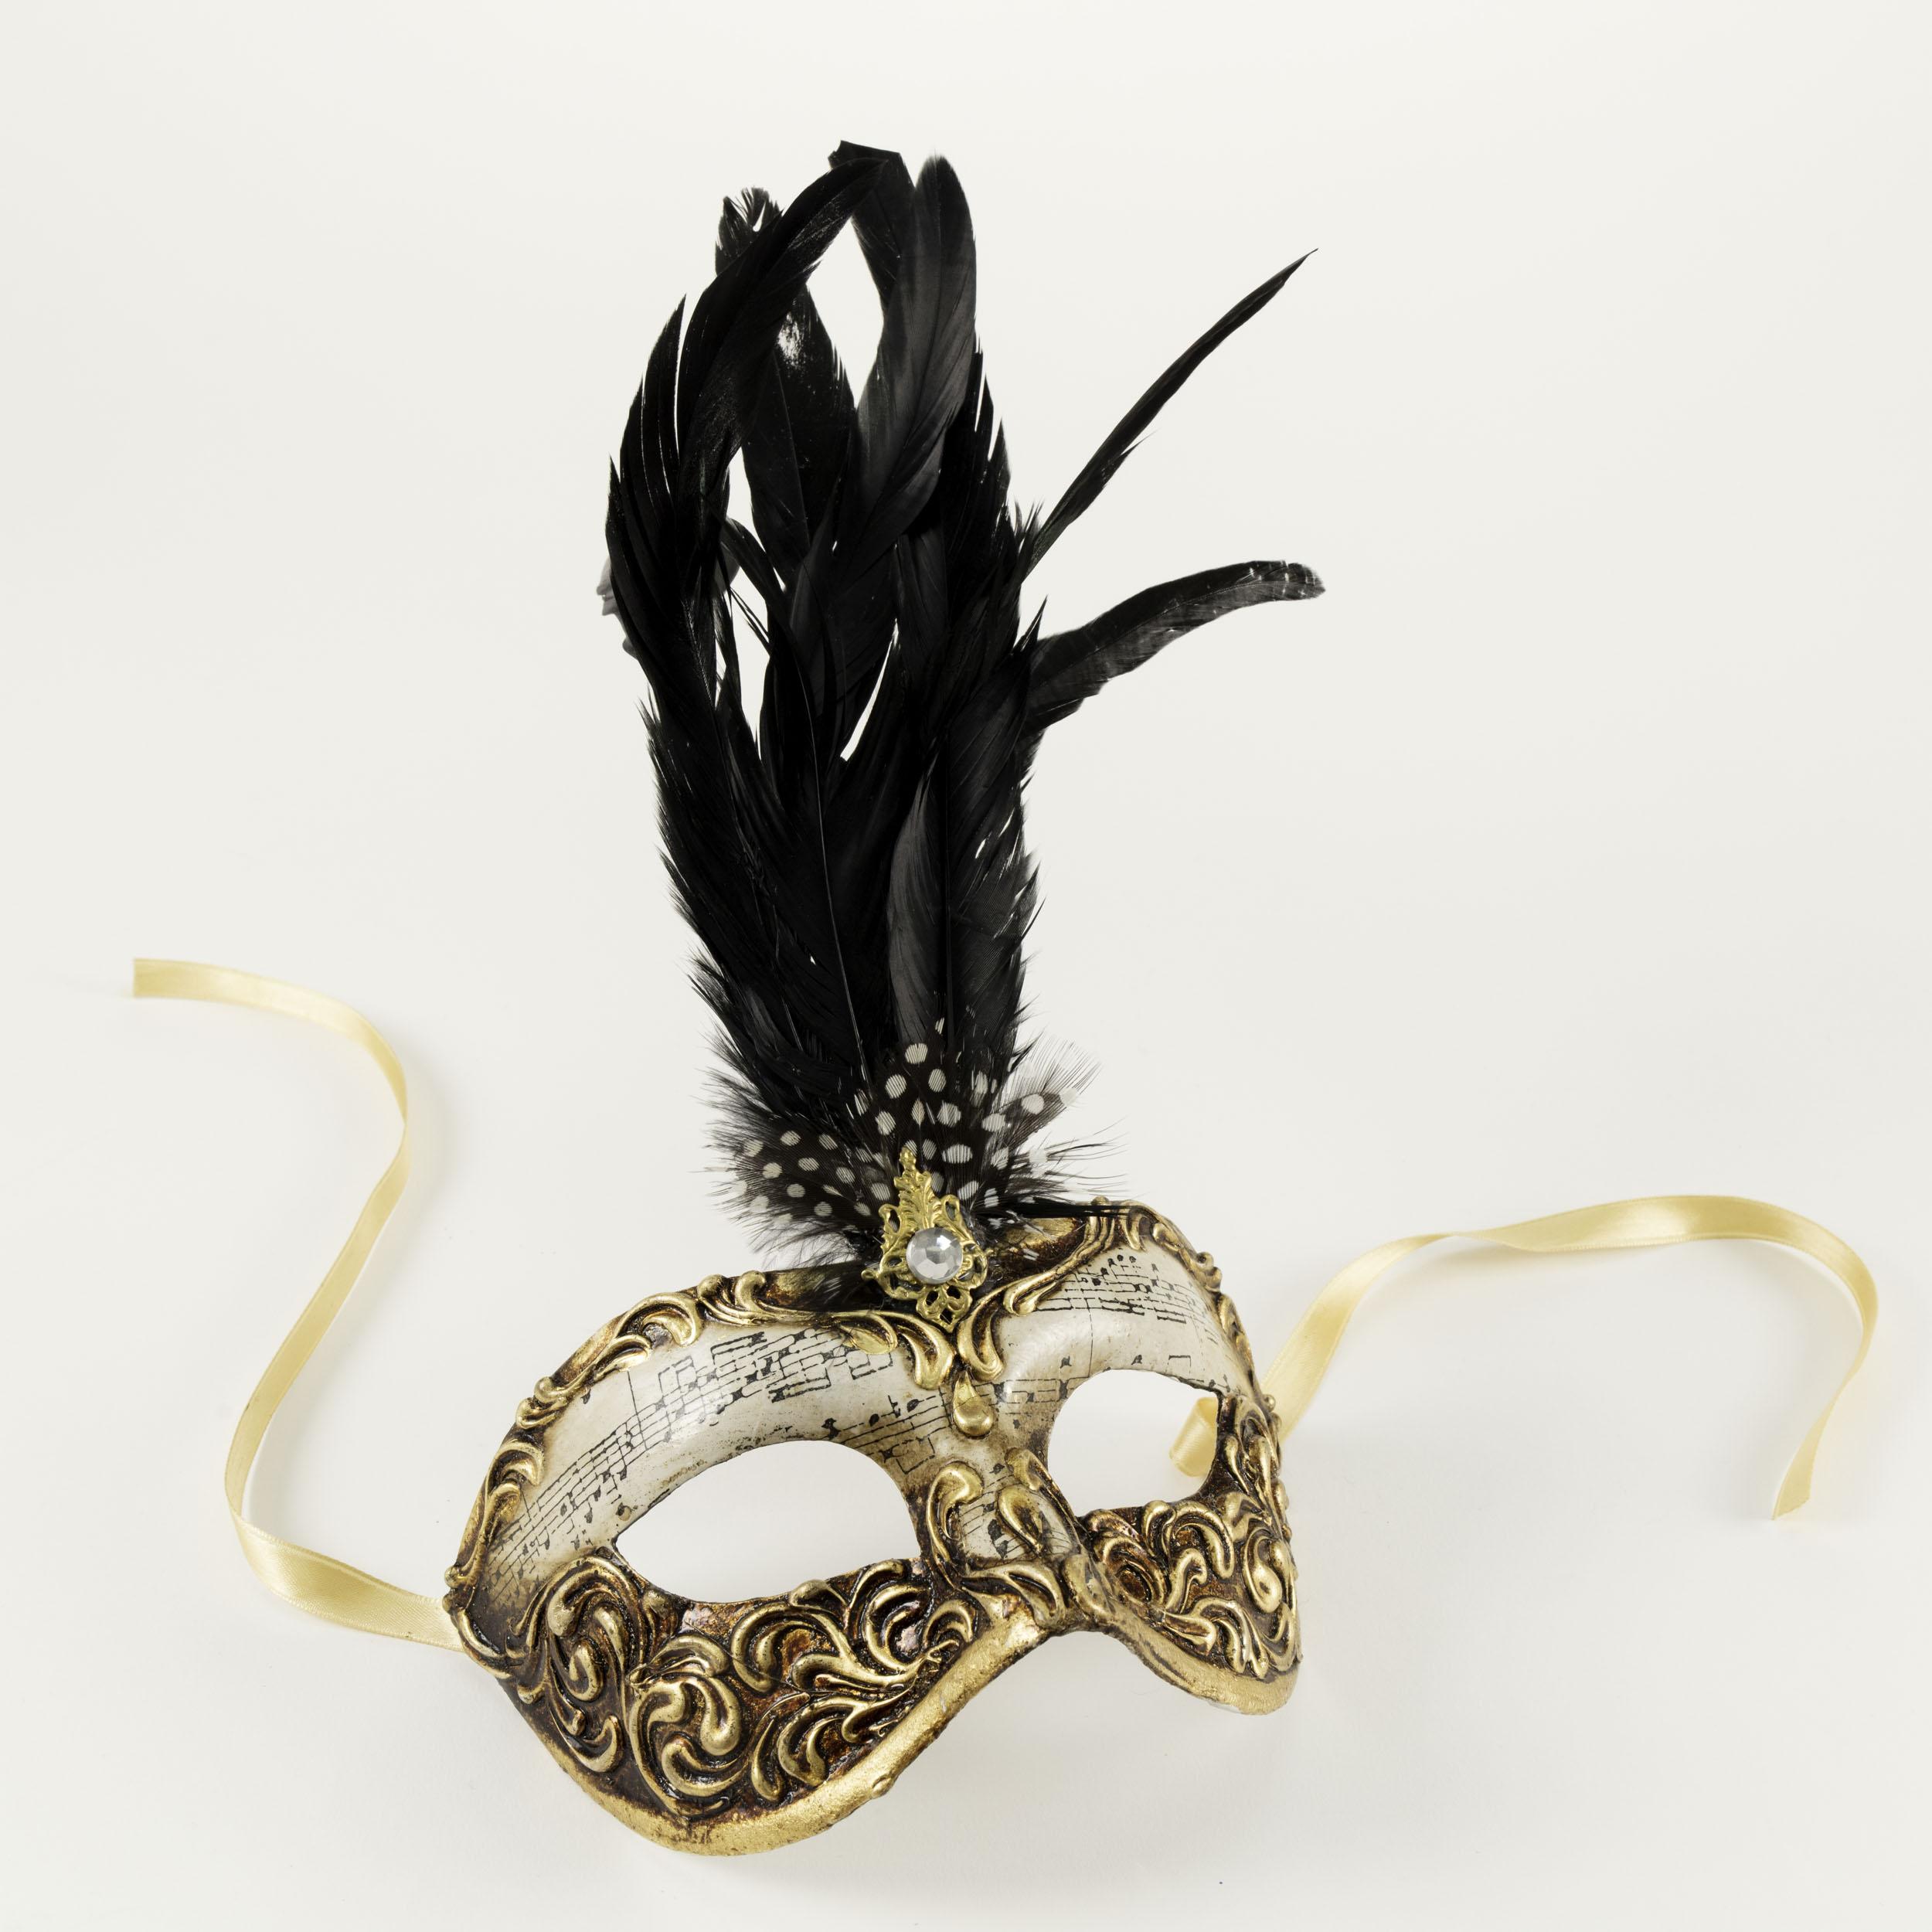 Colombina Capriccio Piume Venetian Mask,C16B